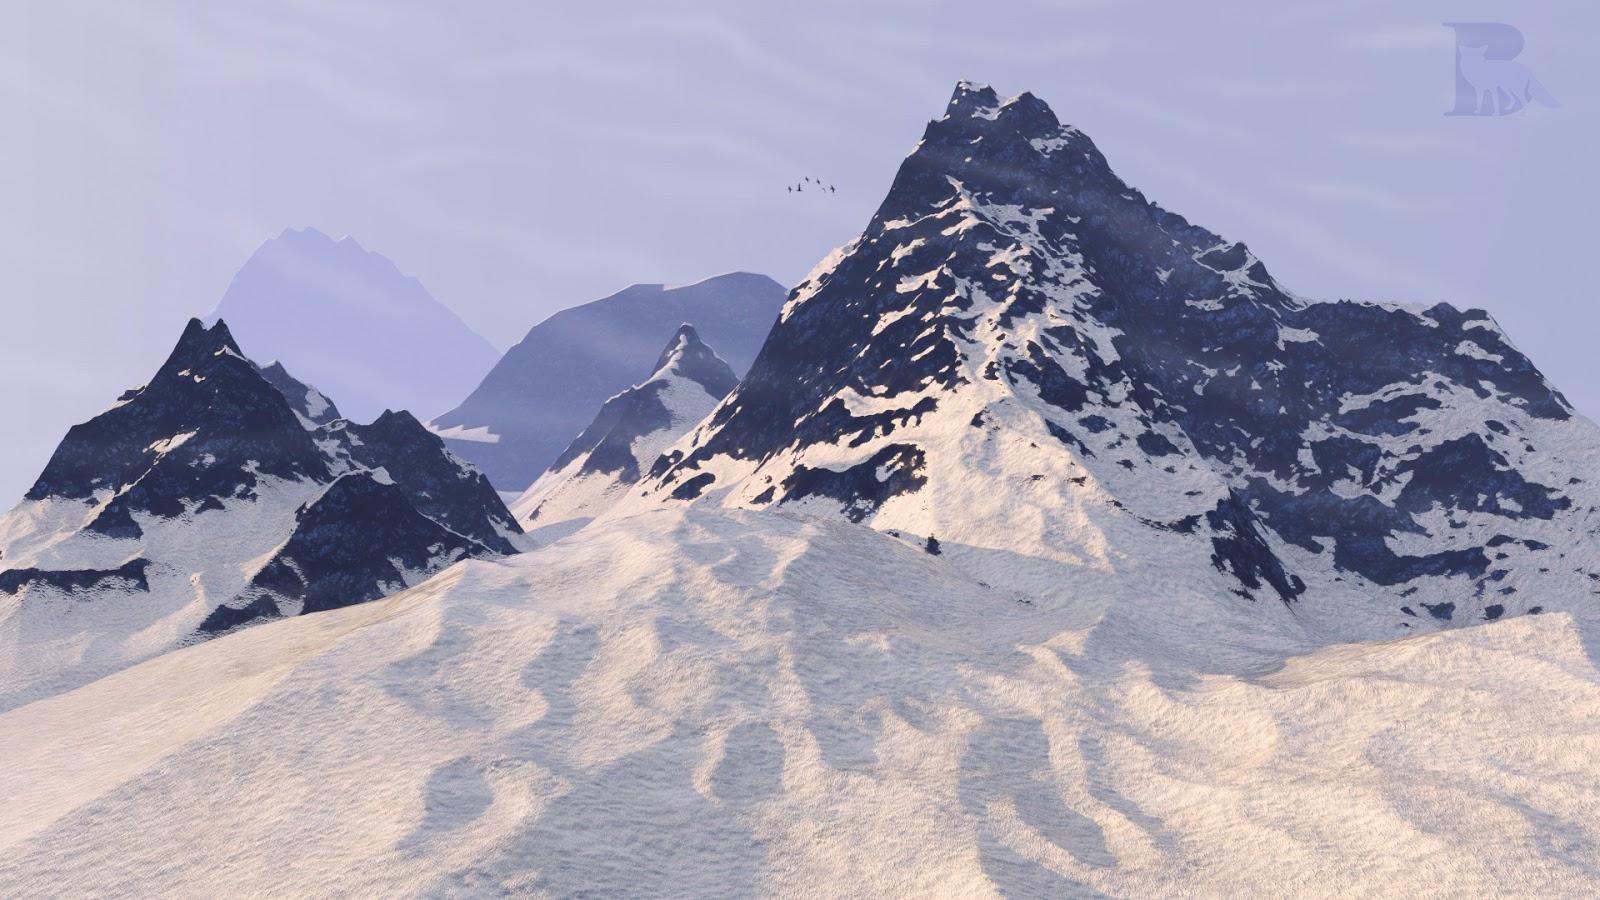 Procedural snowy mountain